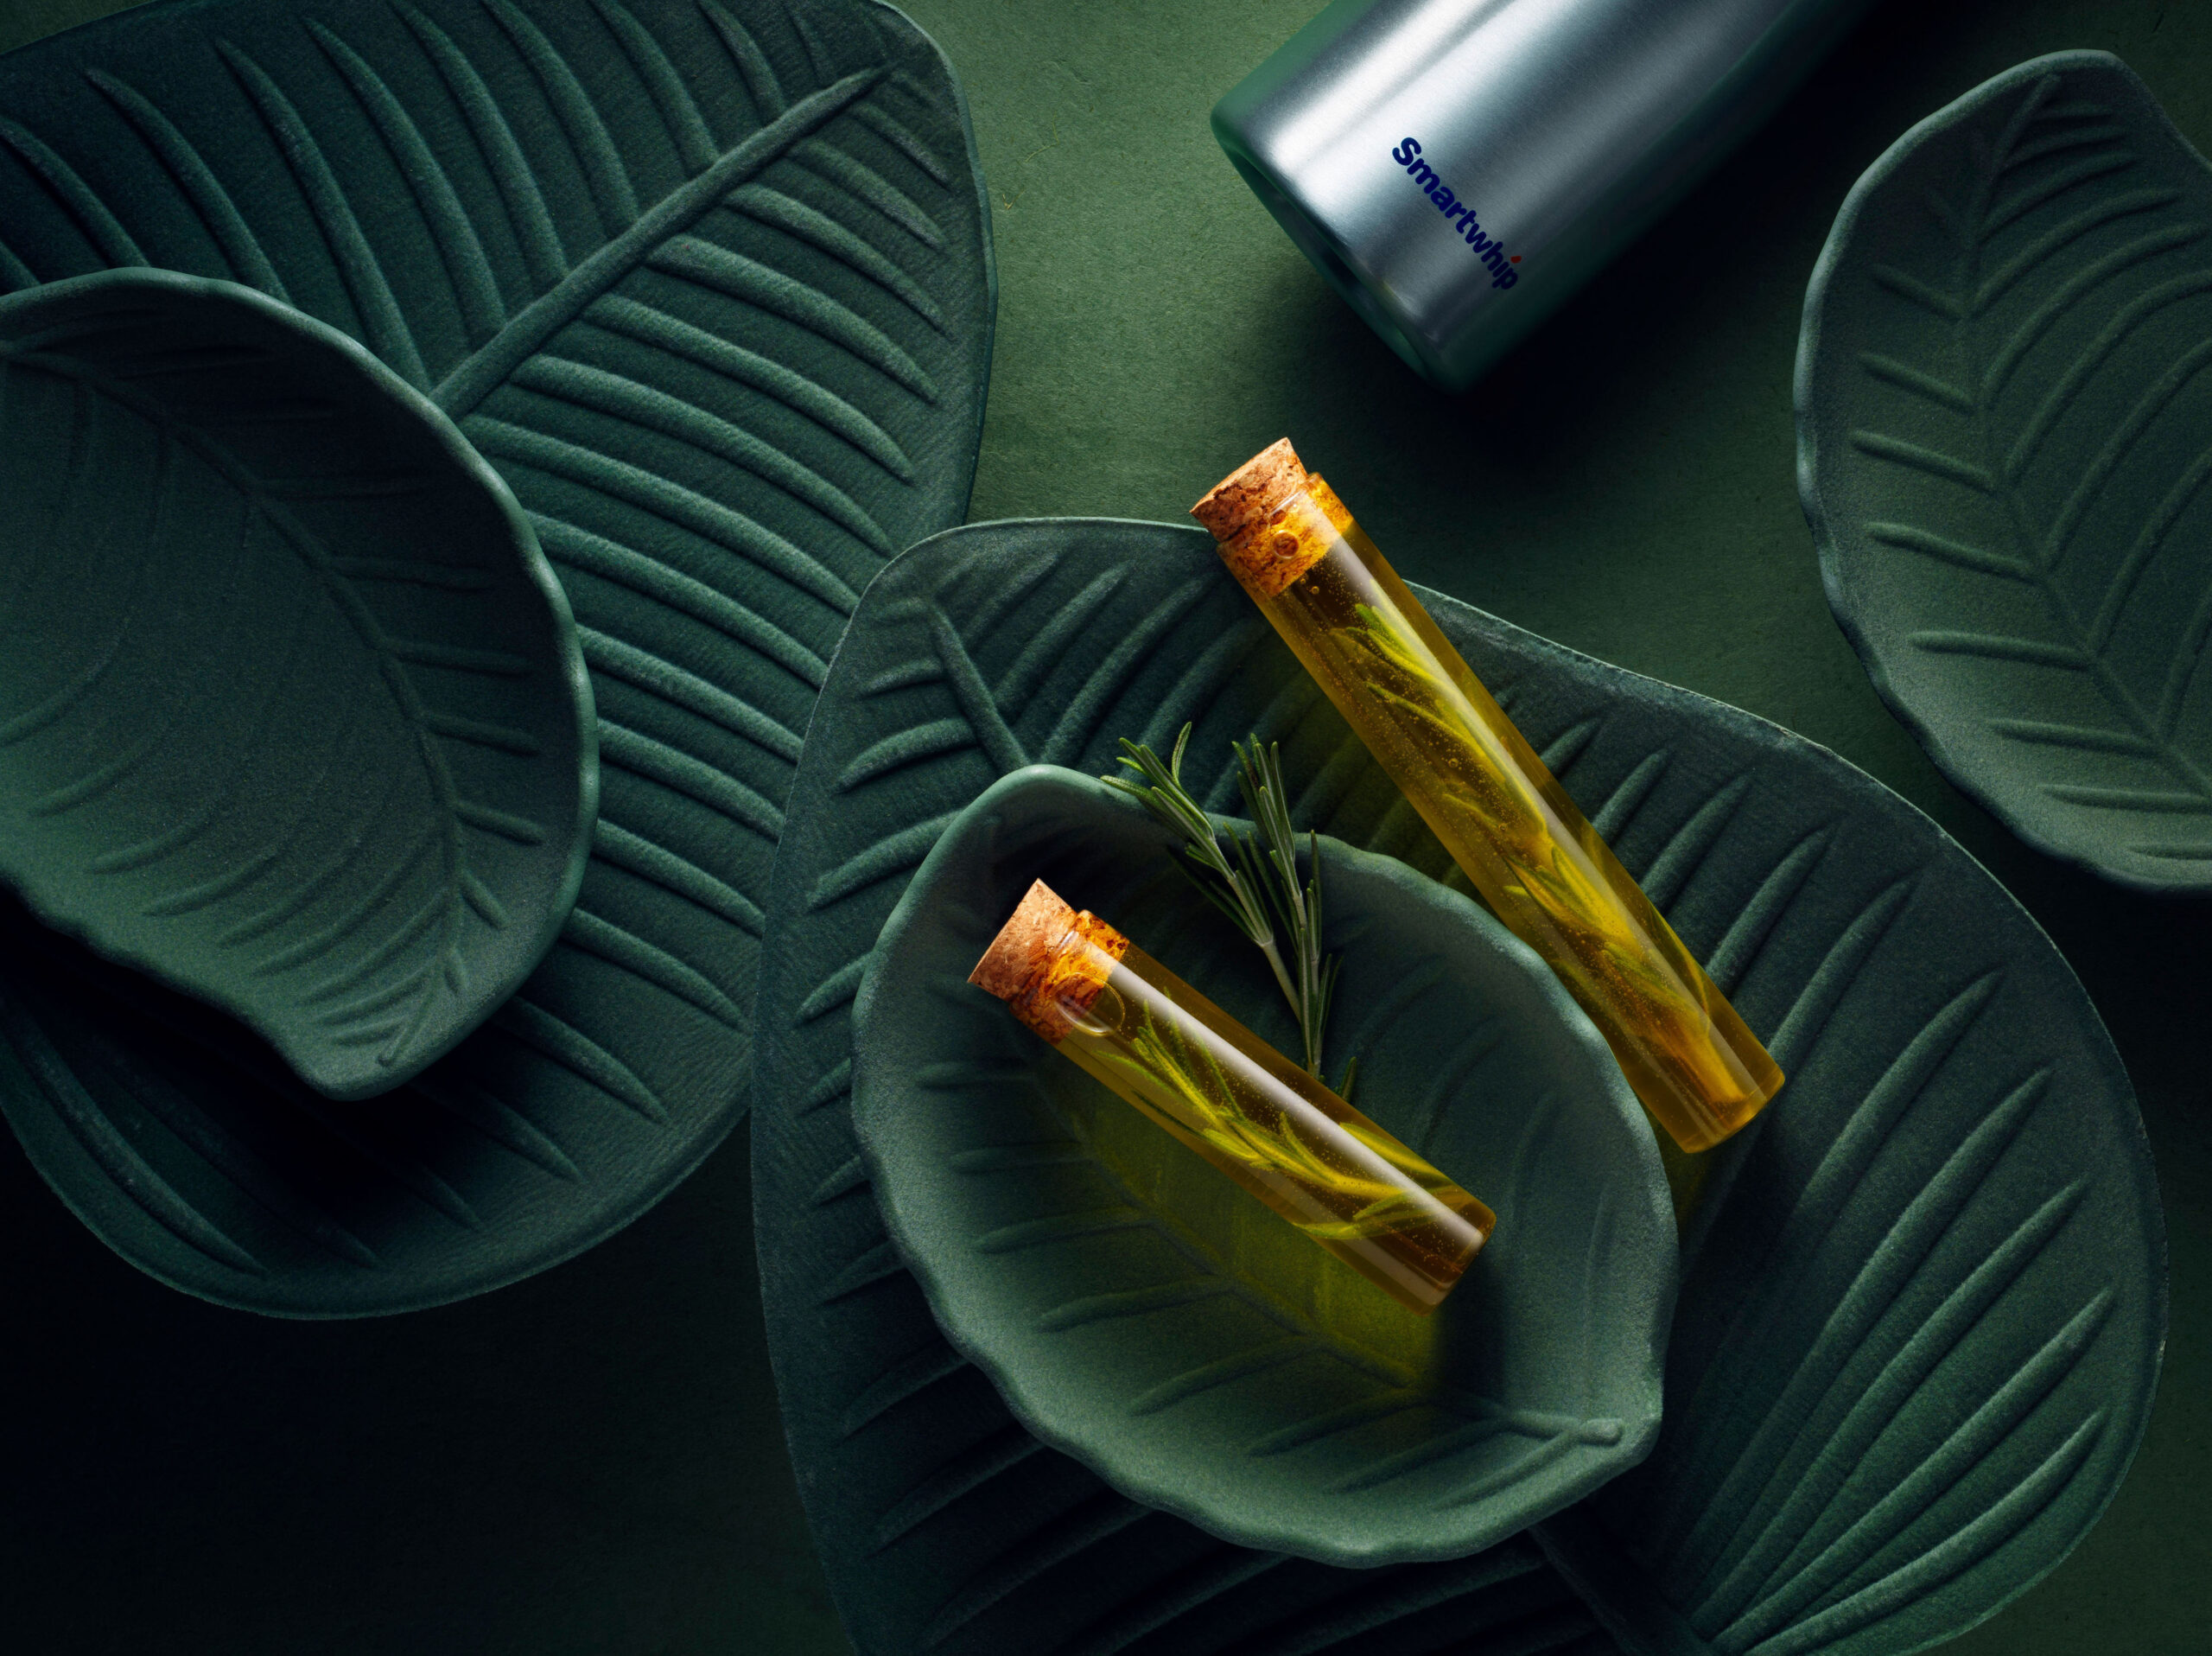 Creative food photo of SmartWhip recipe Rosemary Oil made by STUDIO_M Amsterdam